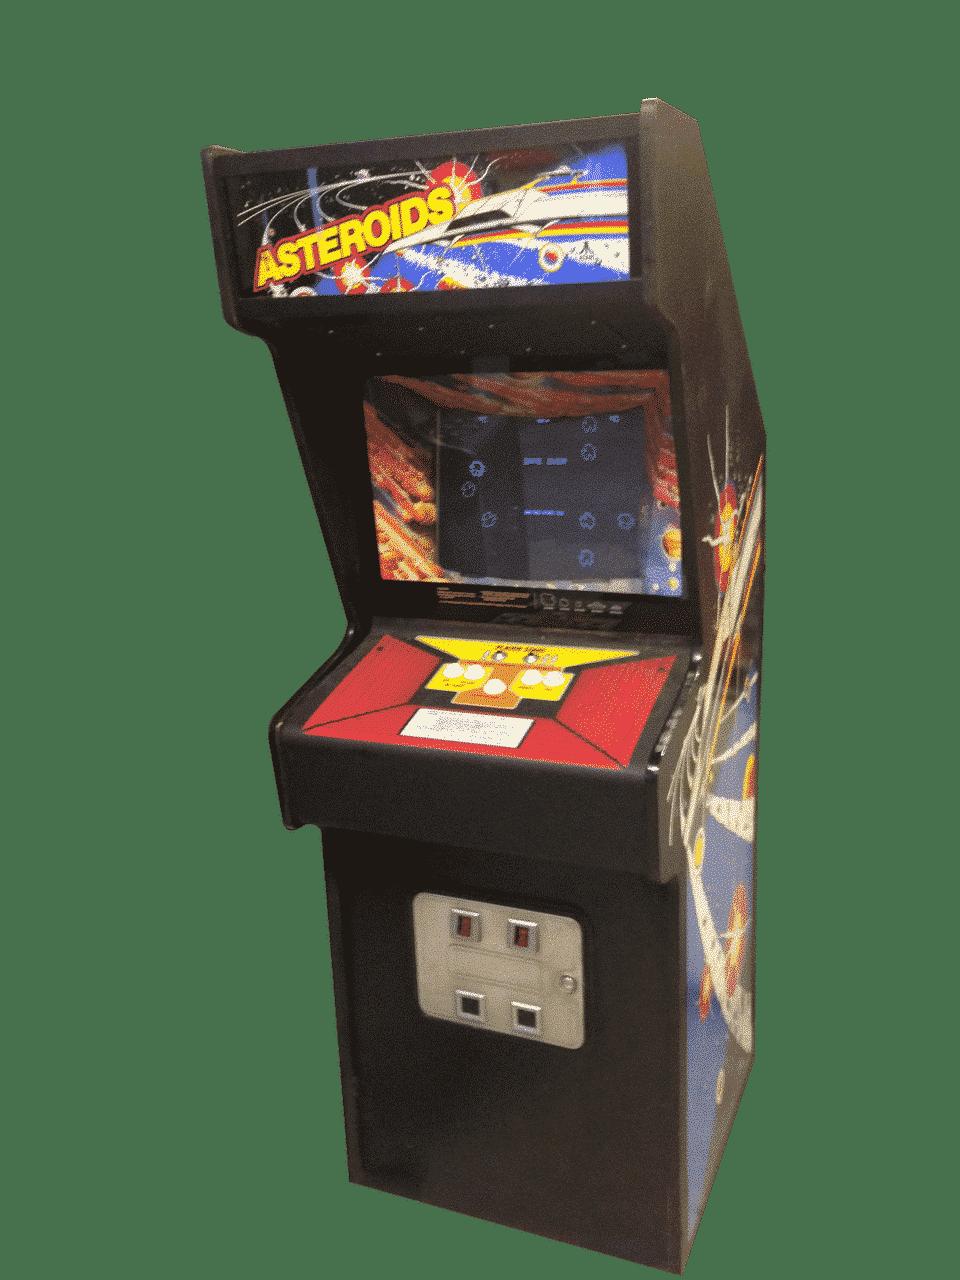 Original Asteroids Arcade Machine